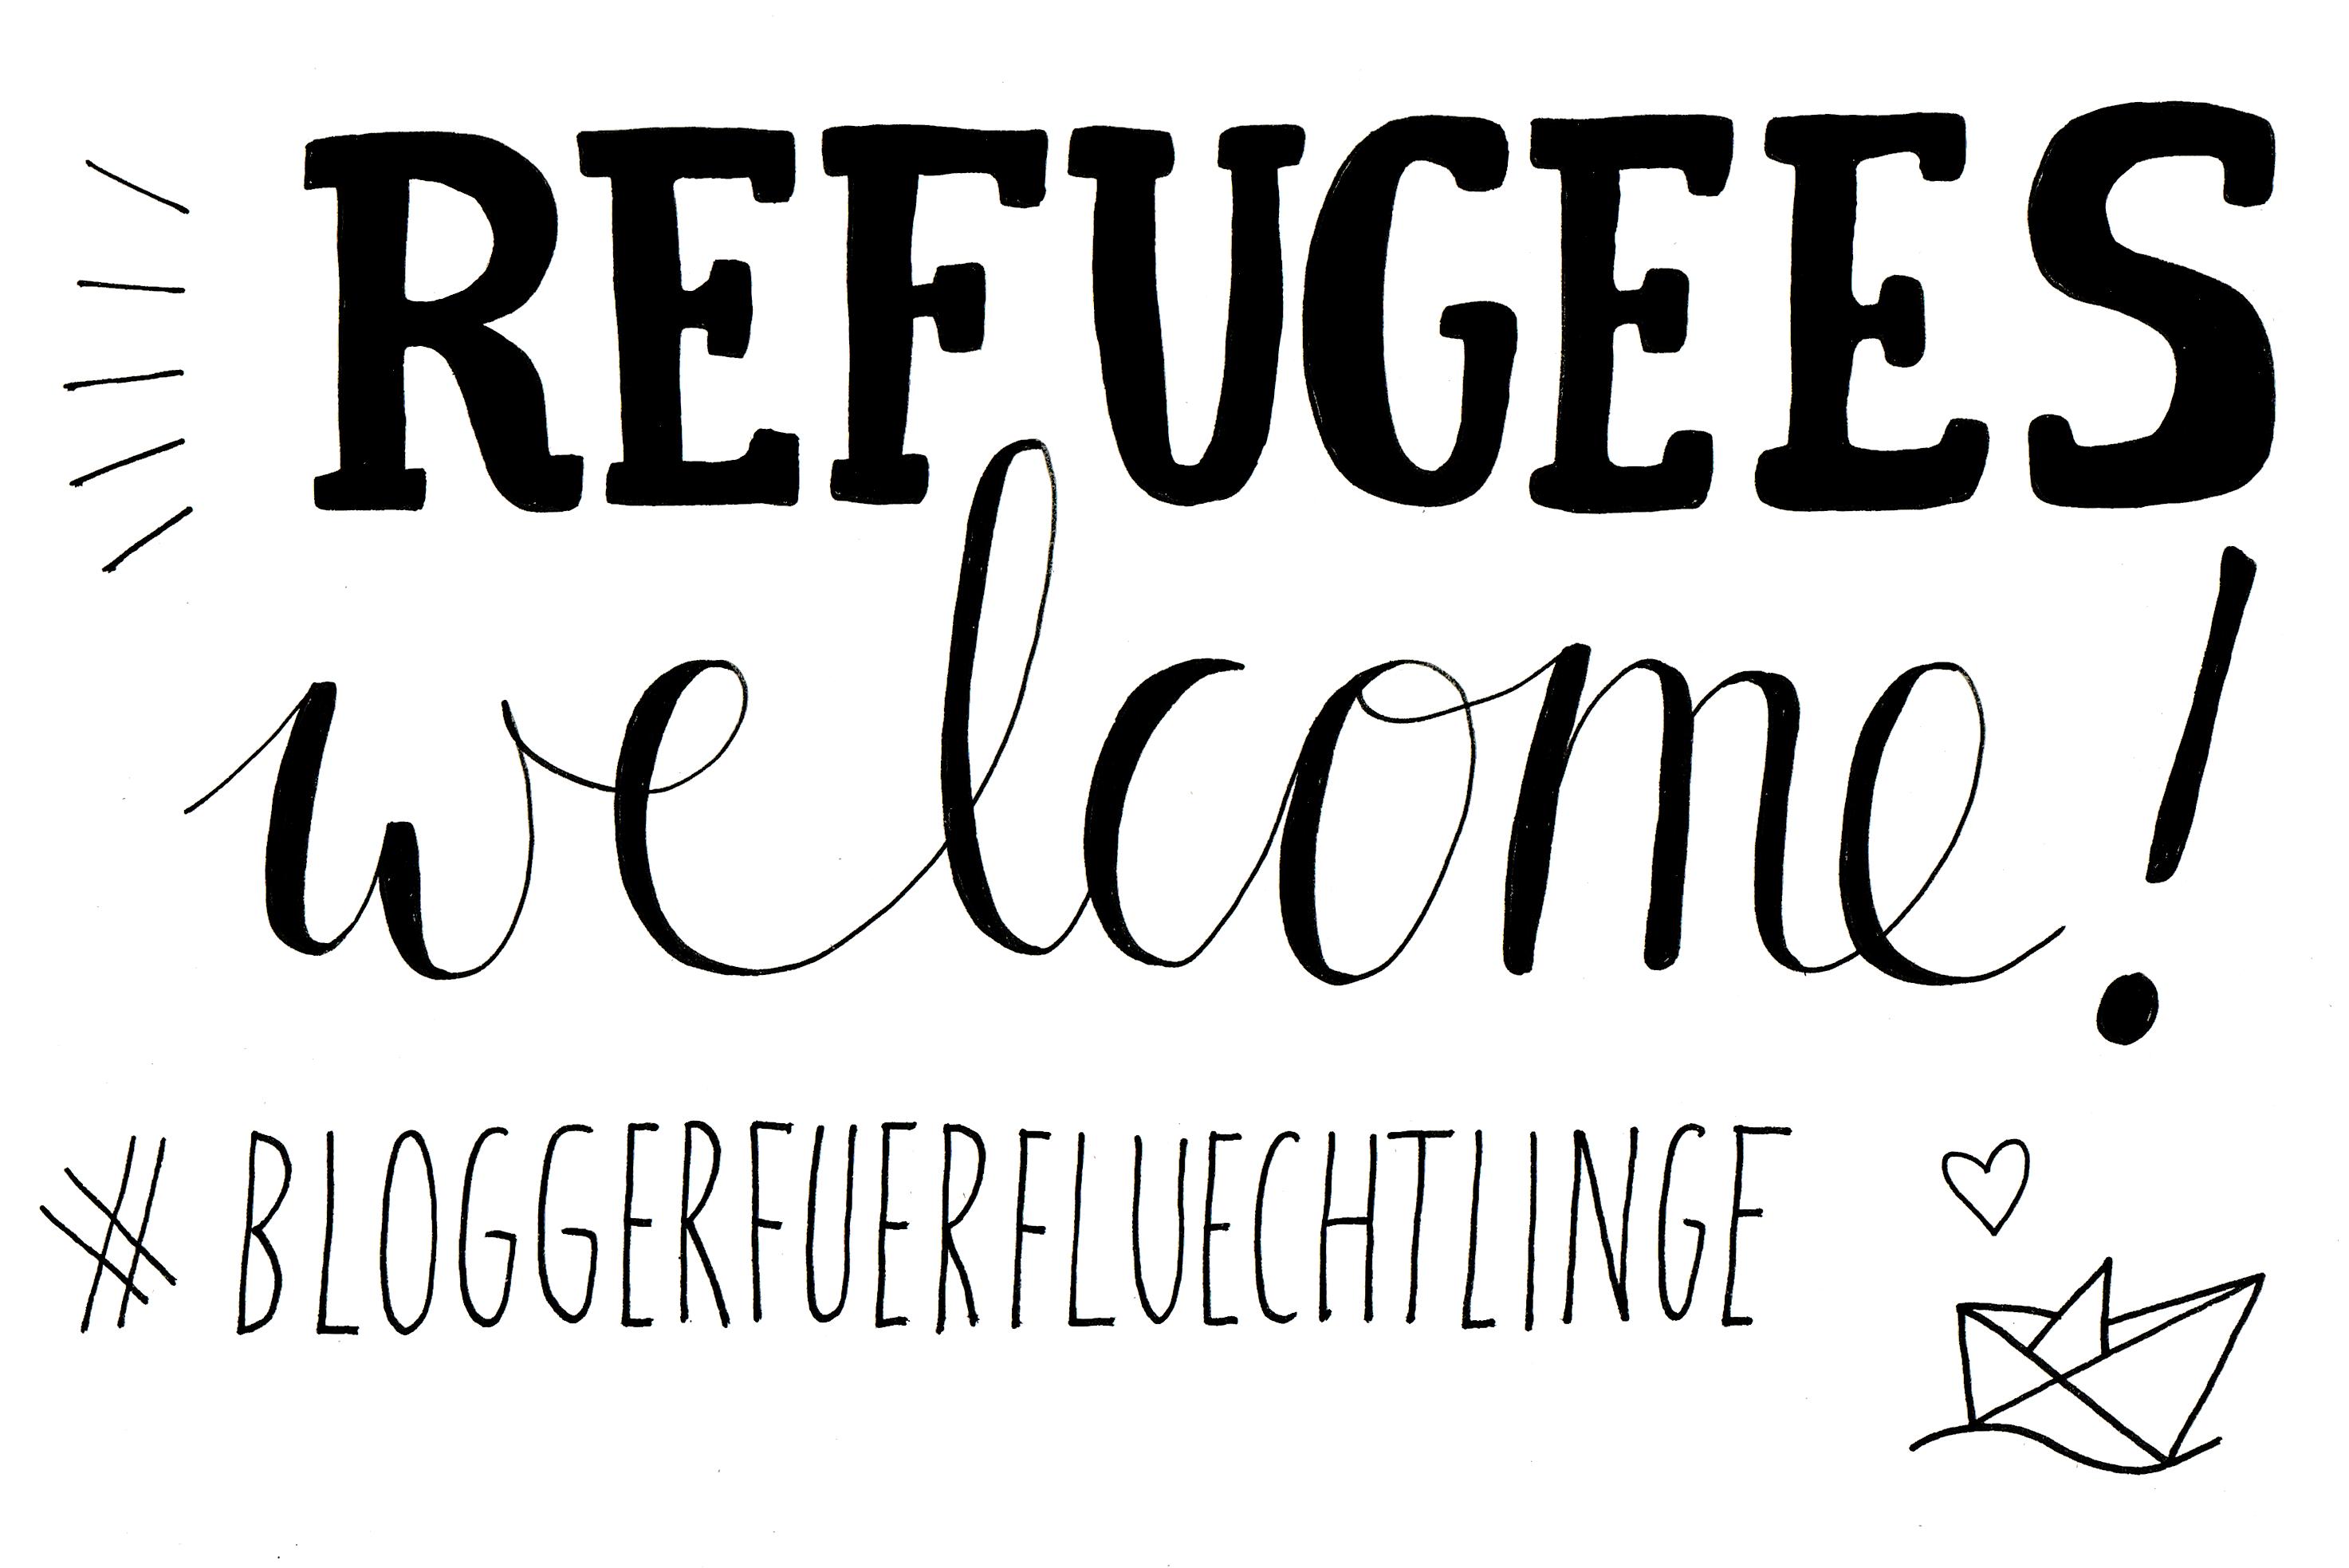 Refugees welcome #bloggerfuerfluechtlinge